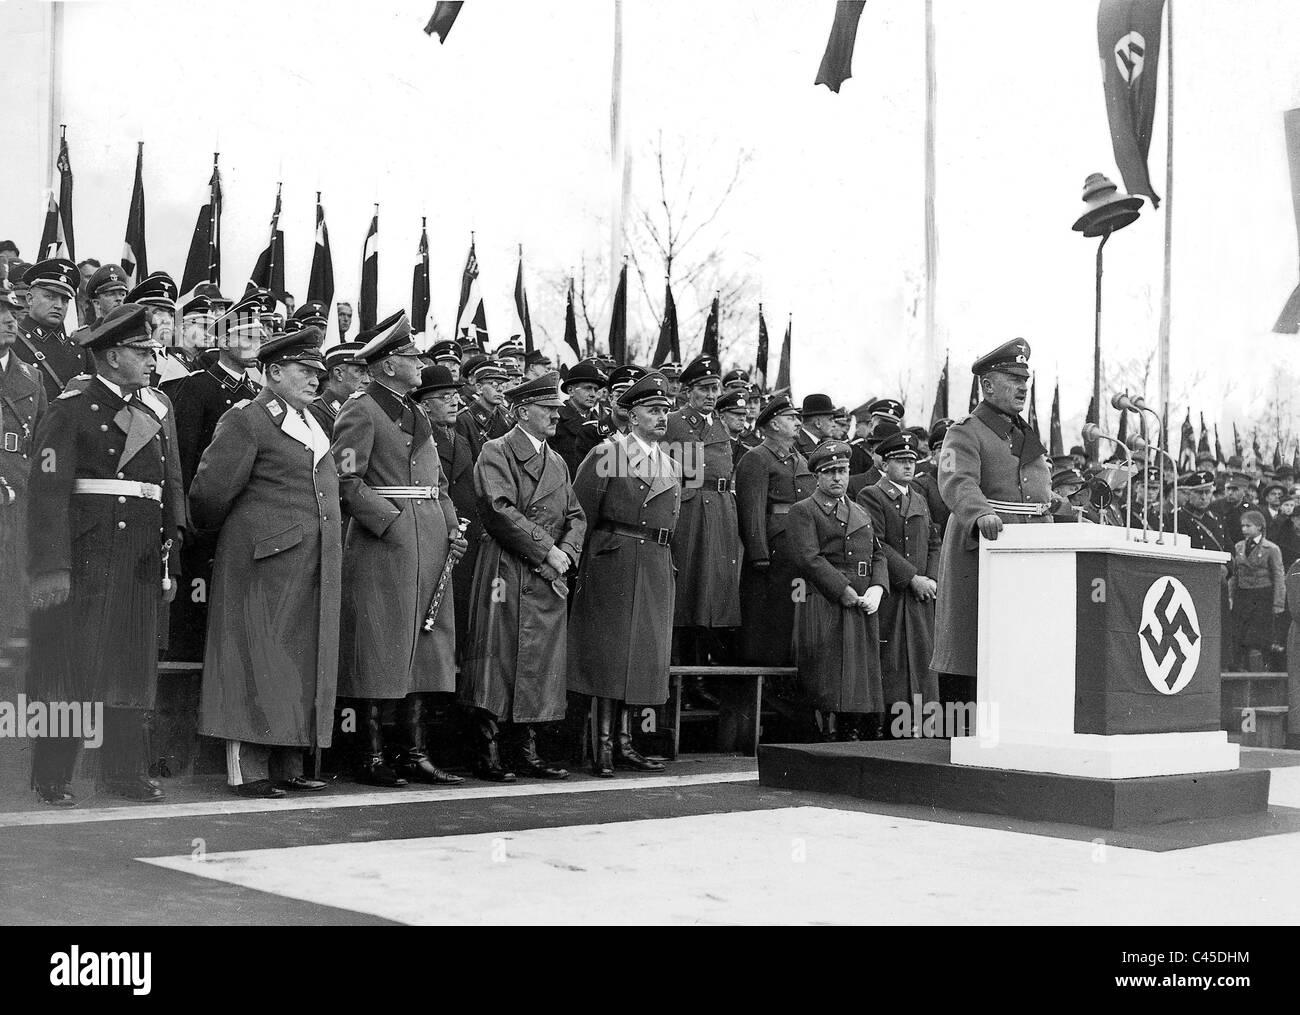 Defense Engineering Faculty in 1937 - Stock Image